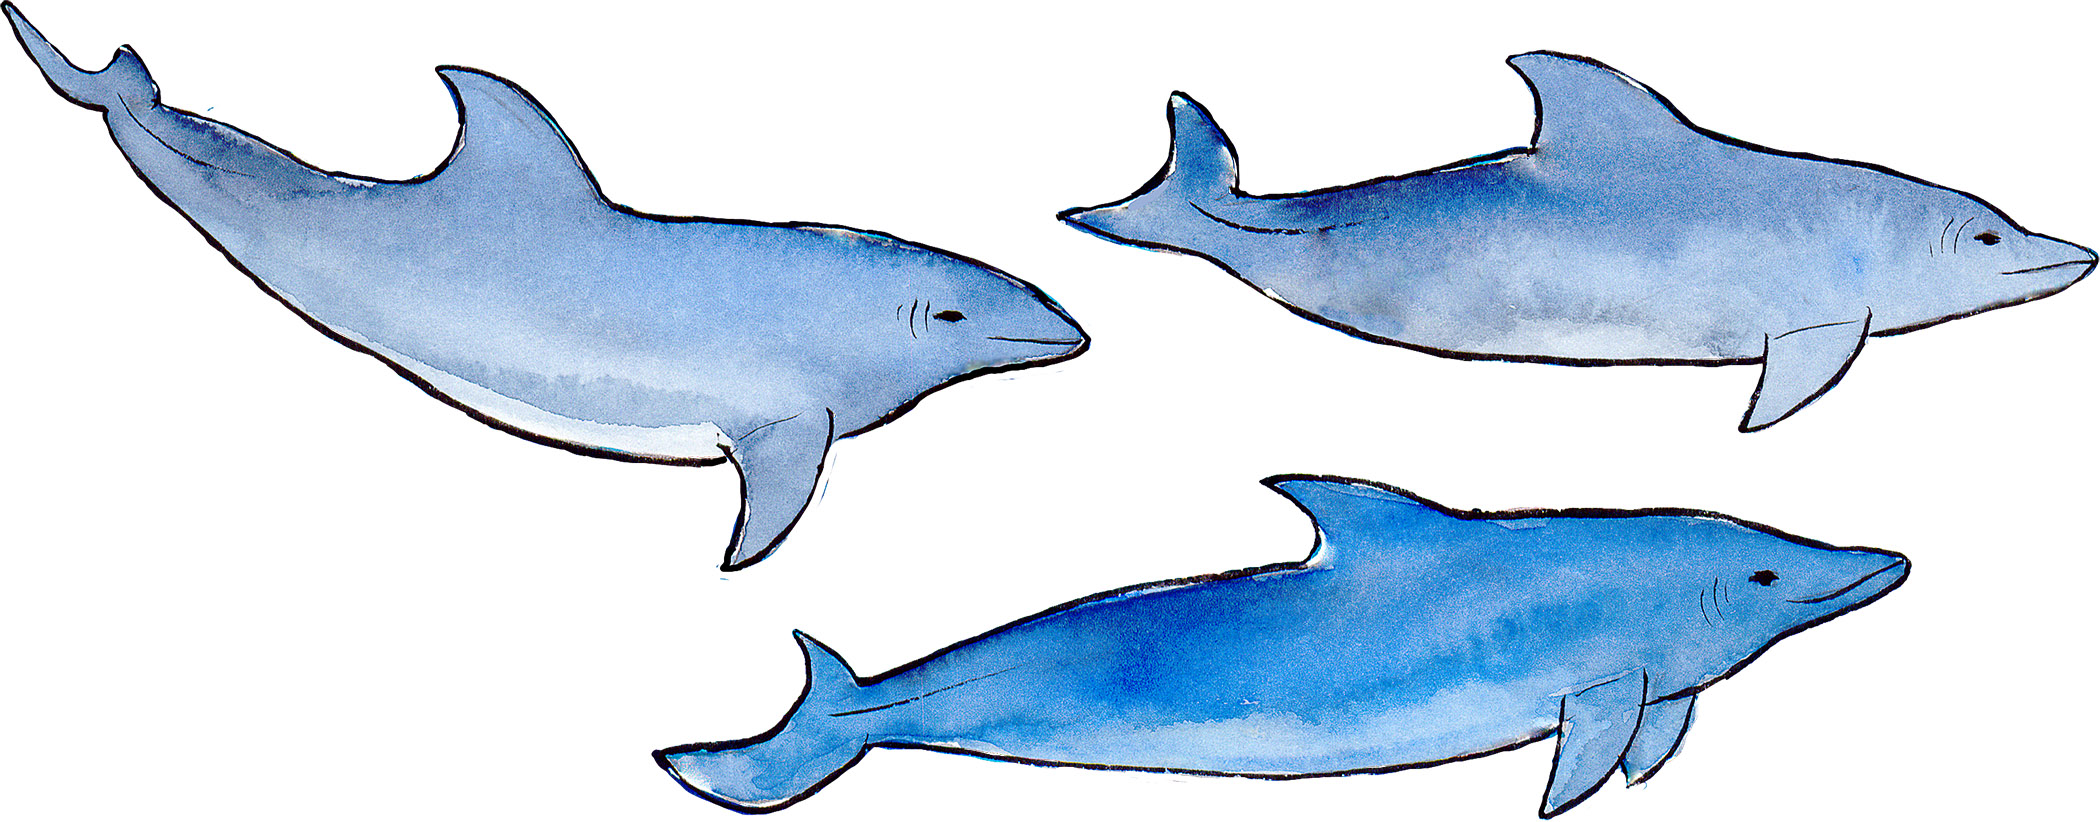 z1 dolphins copy.jpg